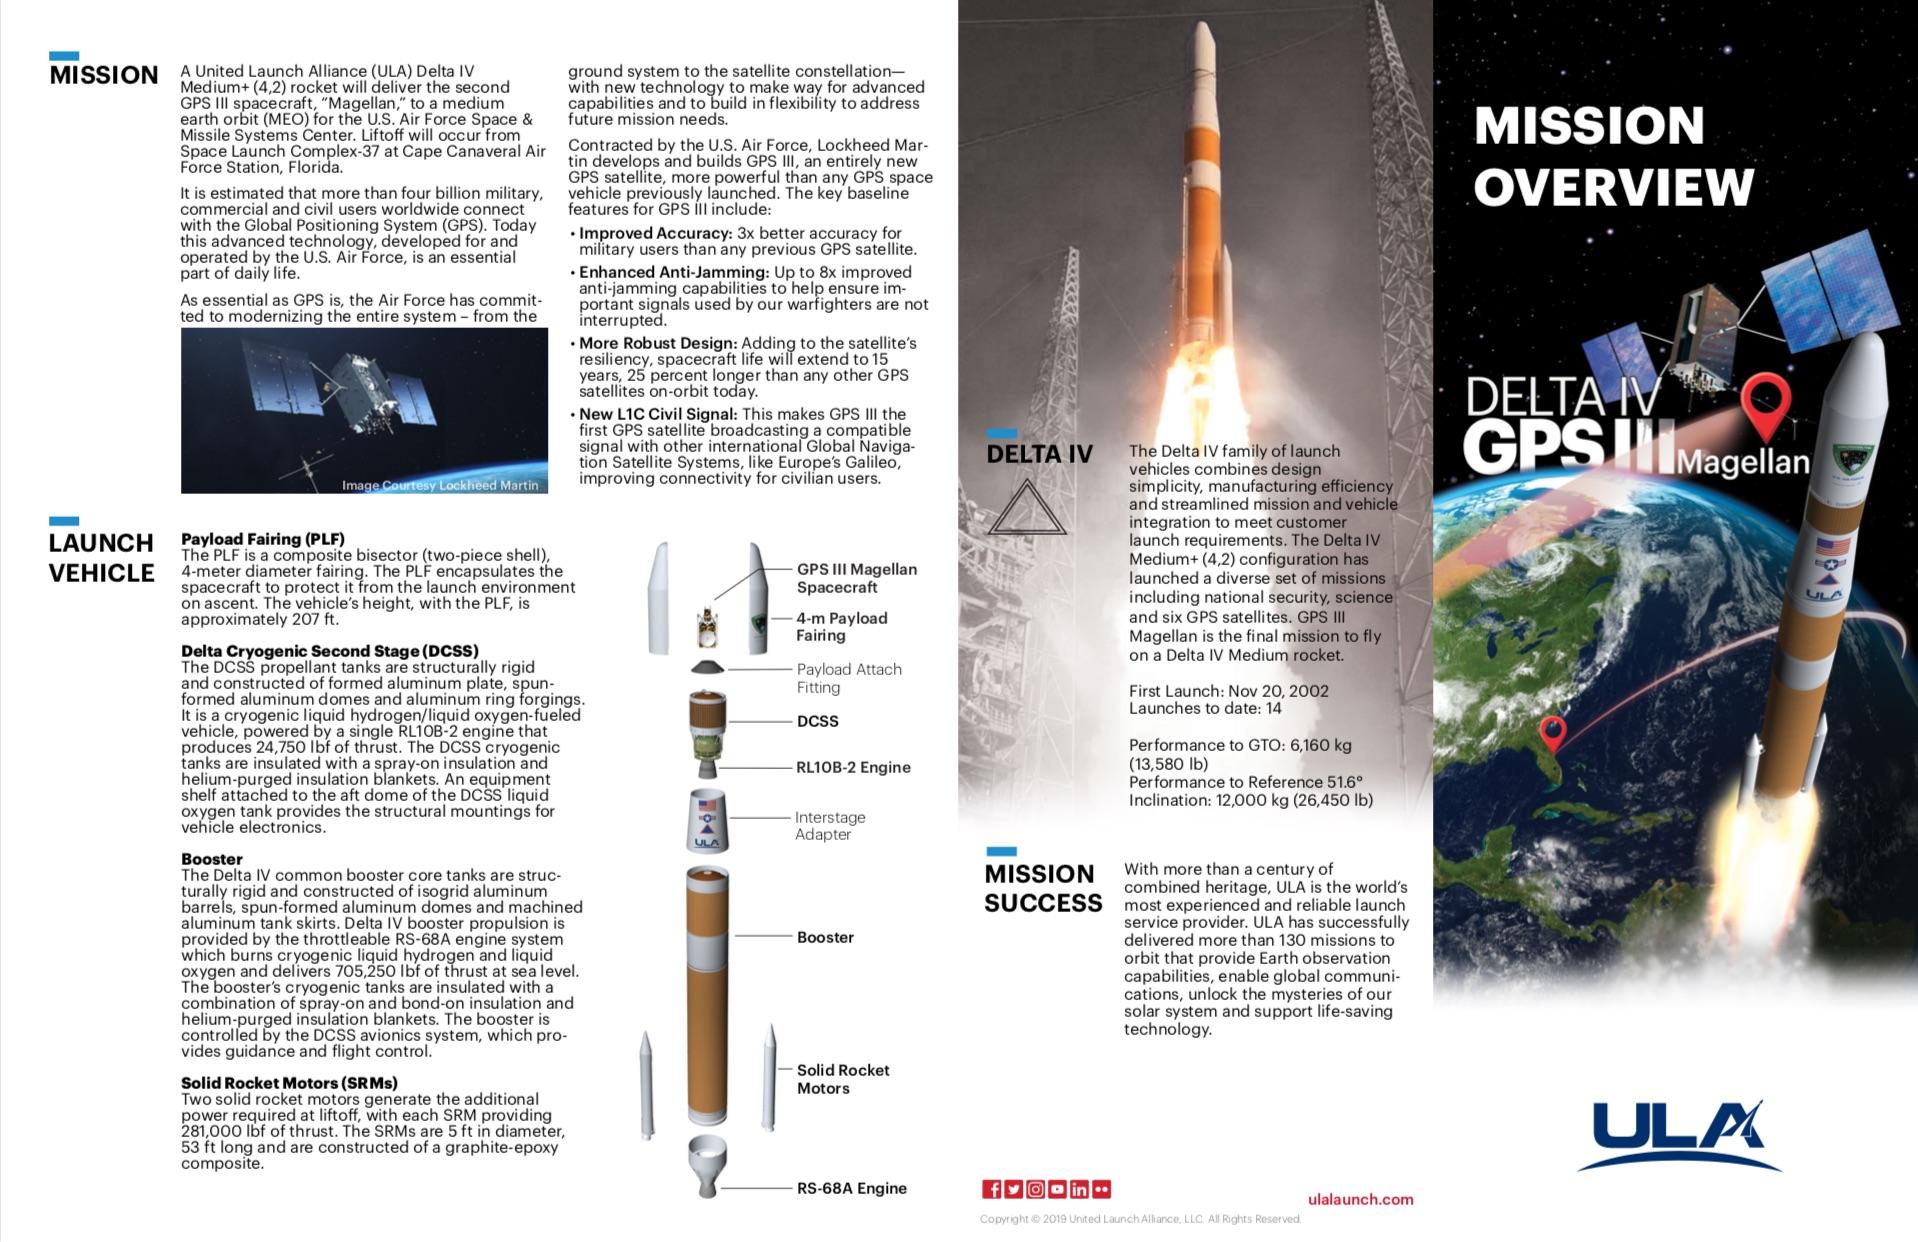 Delta IV GPS III - United Launch Alliance (ULA) Rocket Launch